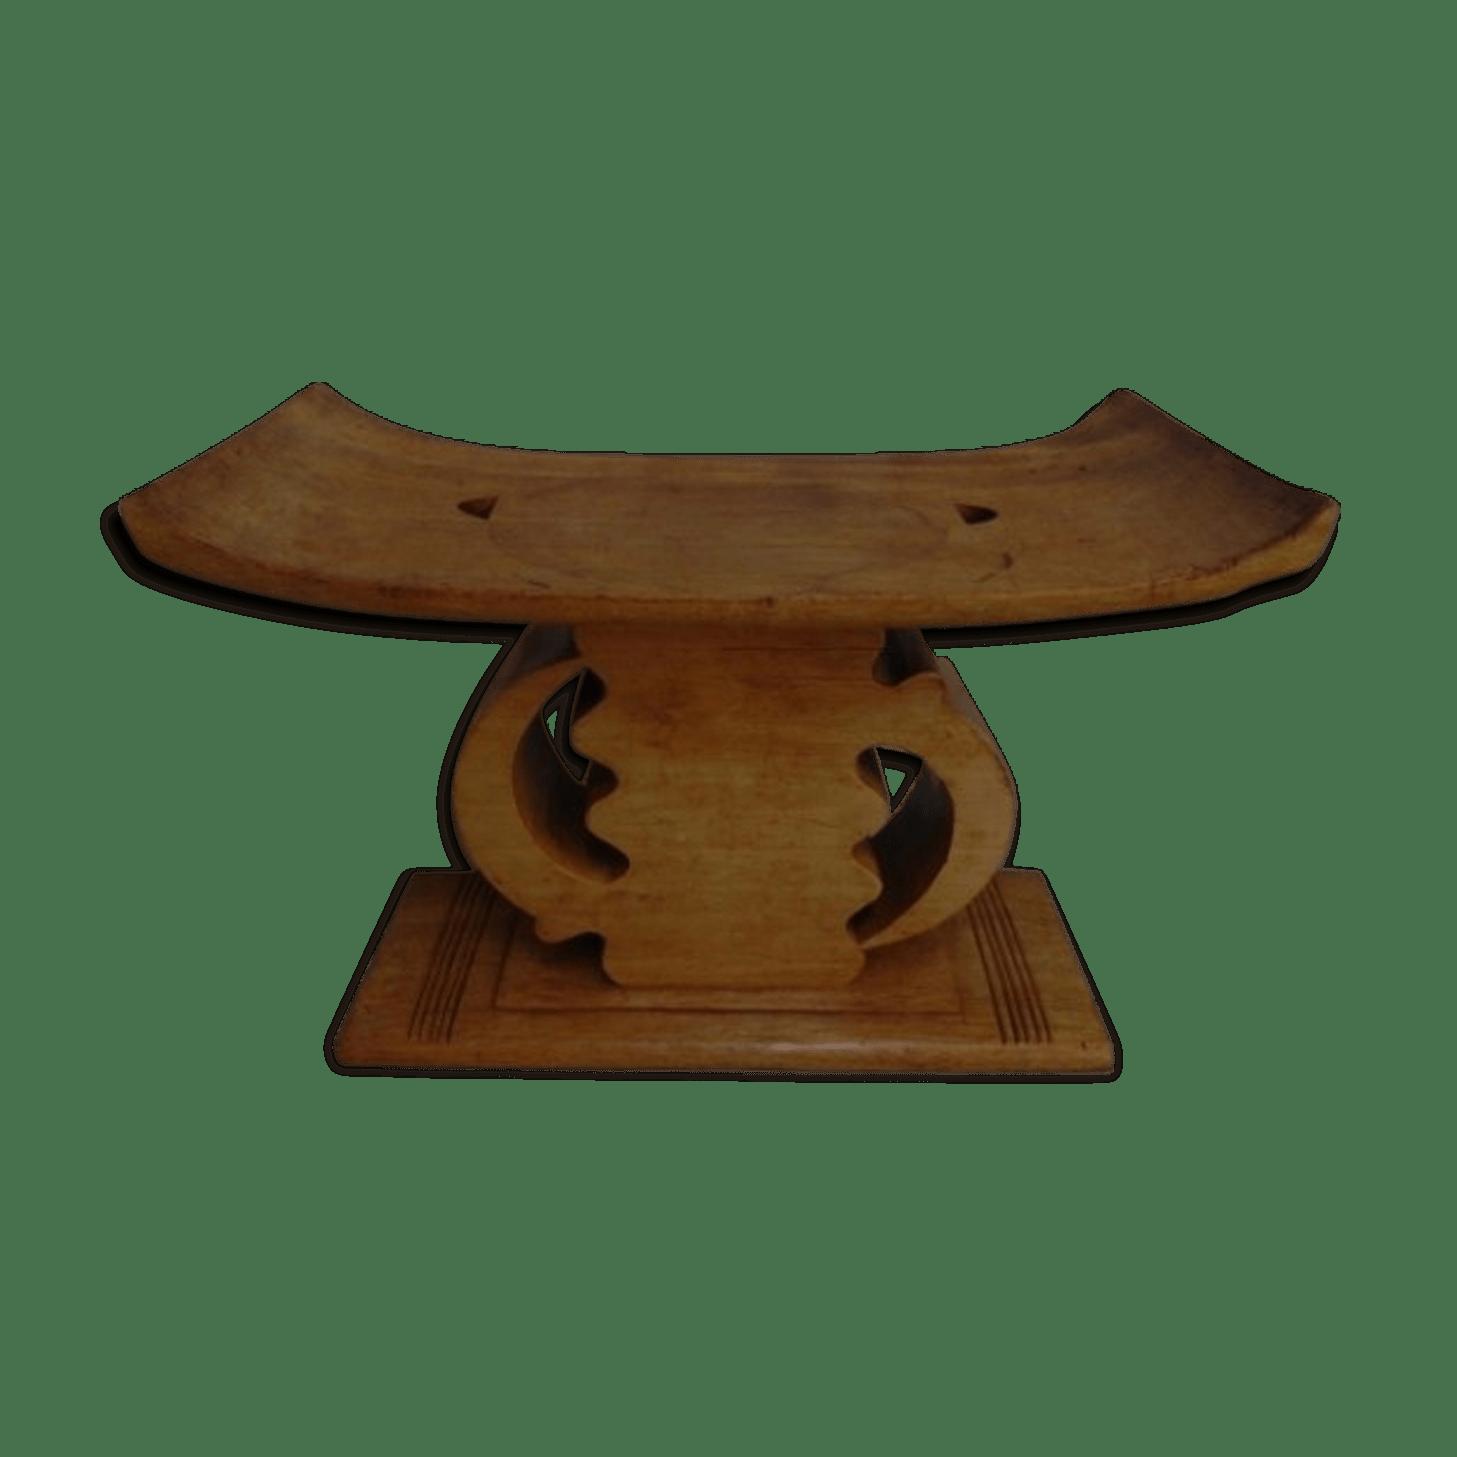 stool chair ghana antique wooden arm gye nyame from ashanti wood ethnic o40ywsb